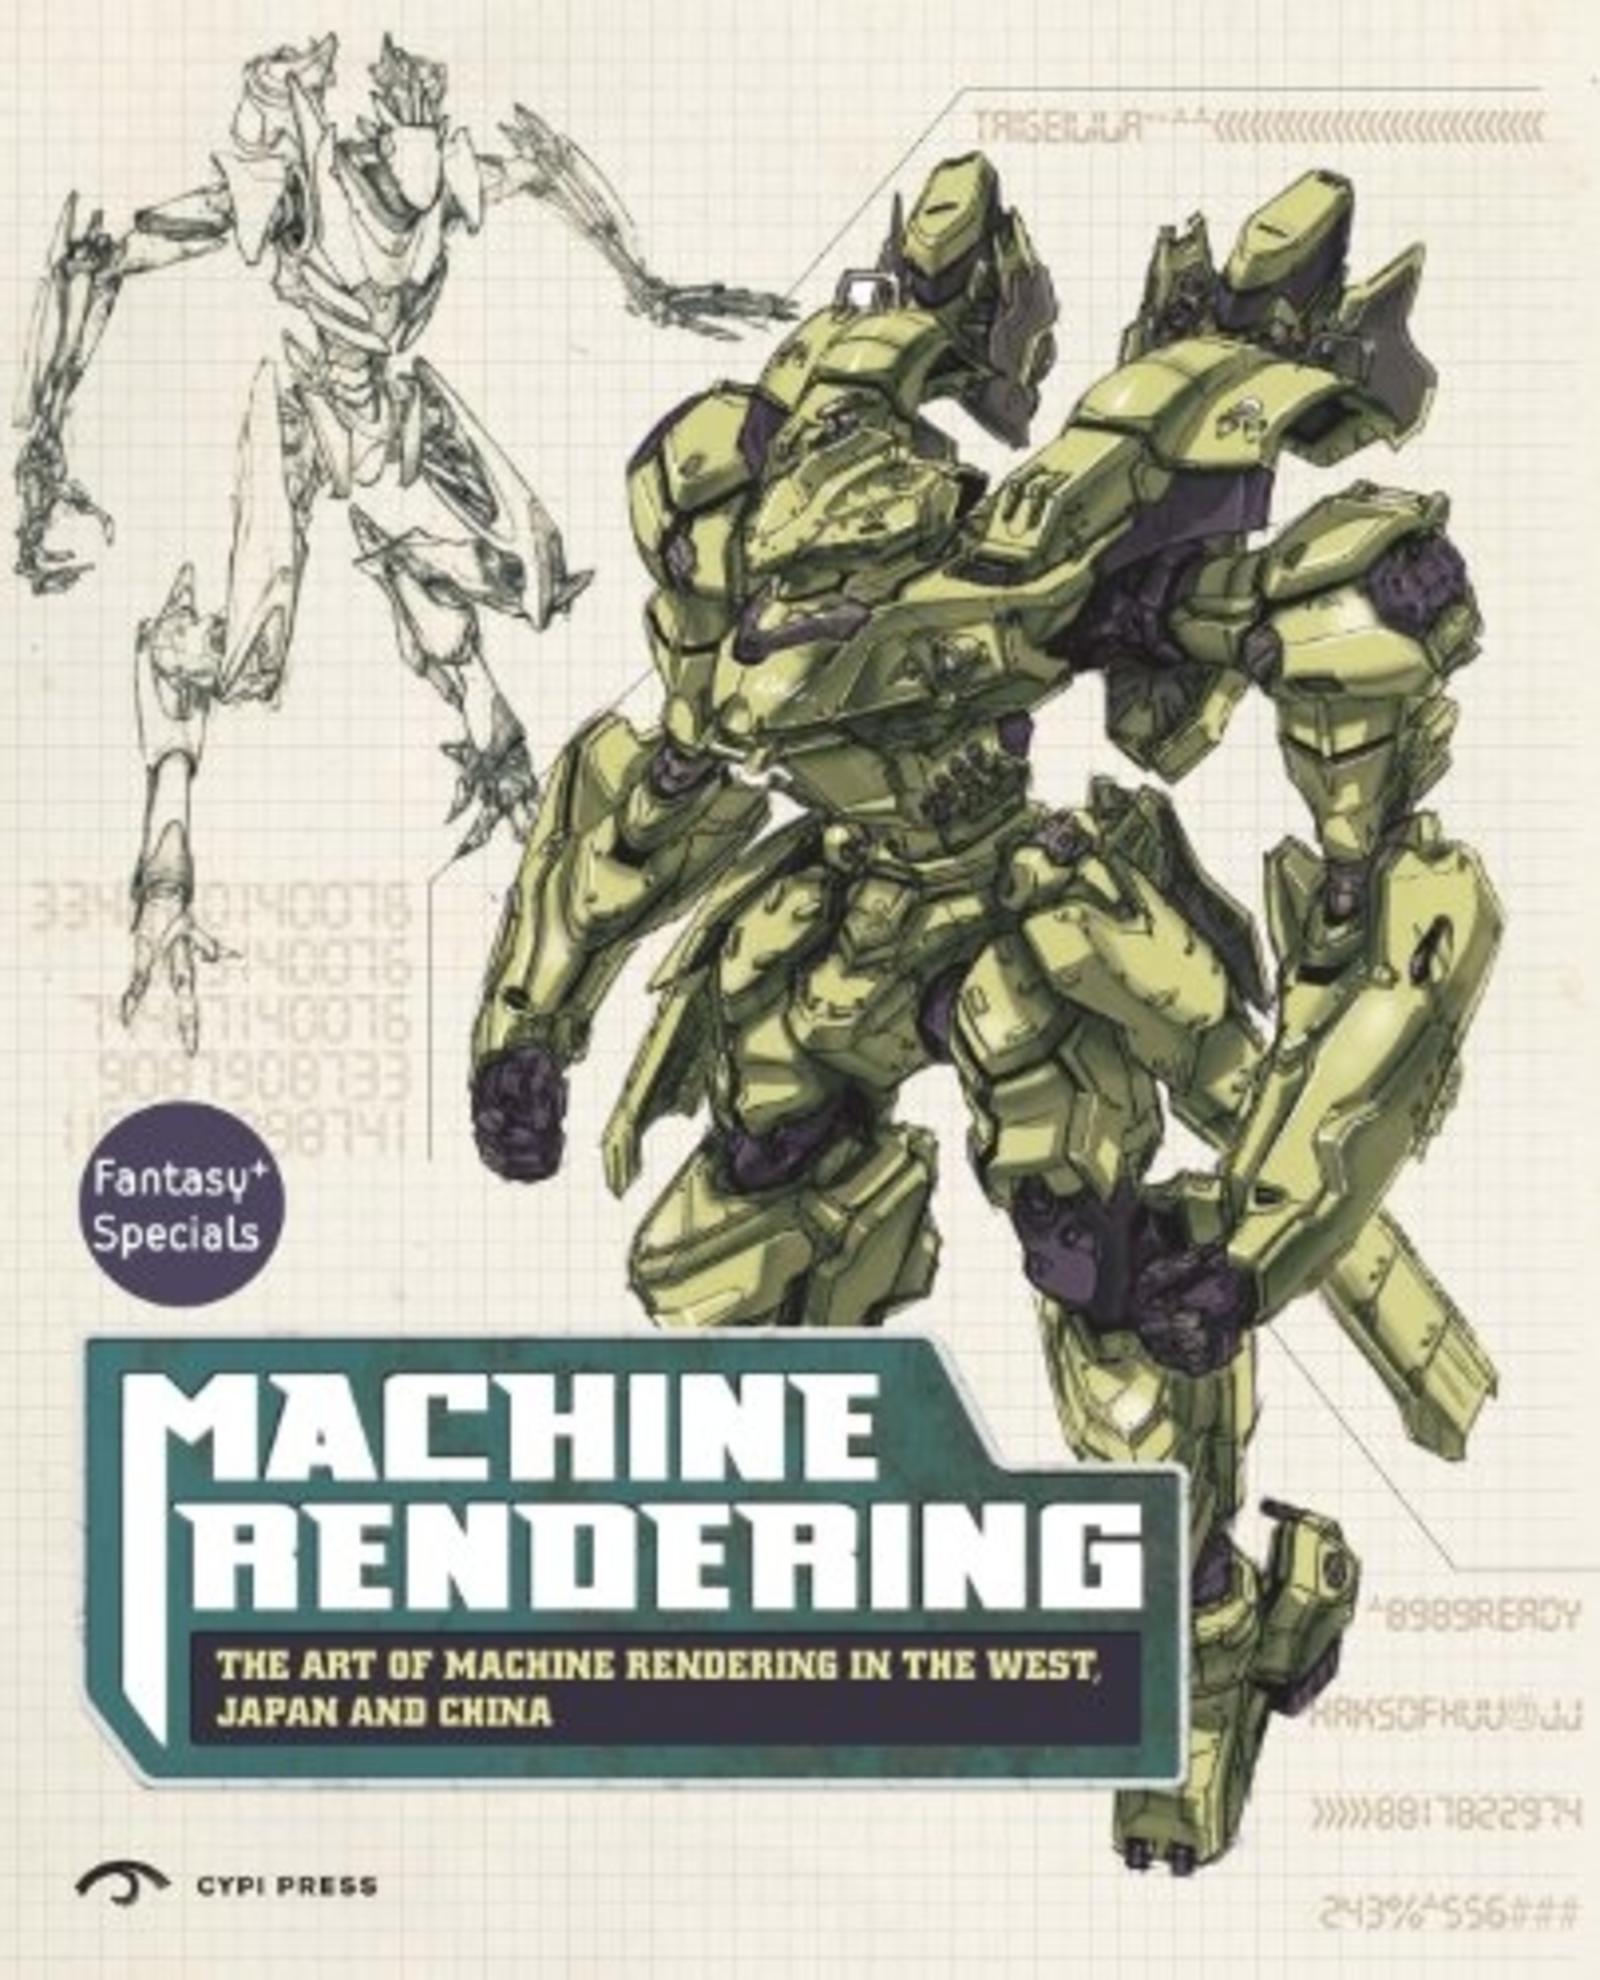 MACHINE RENDERING